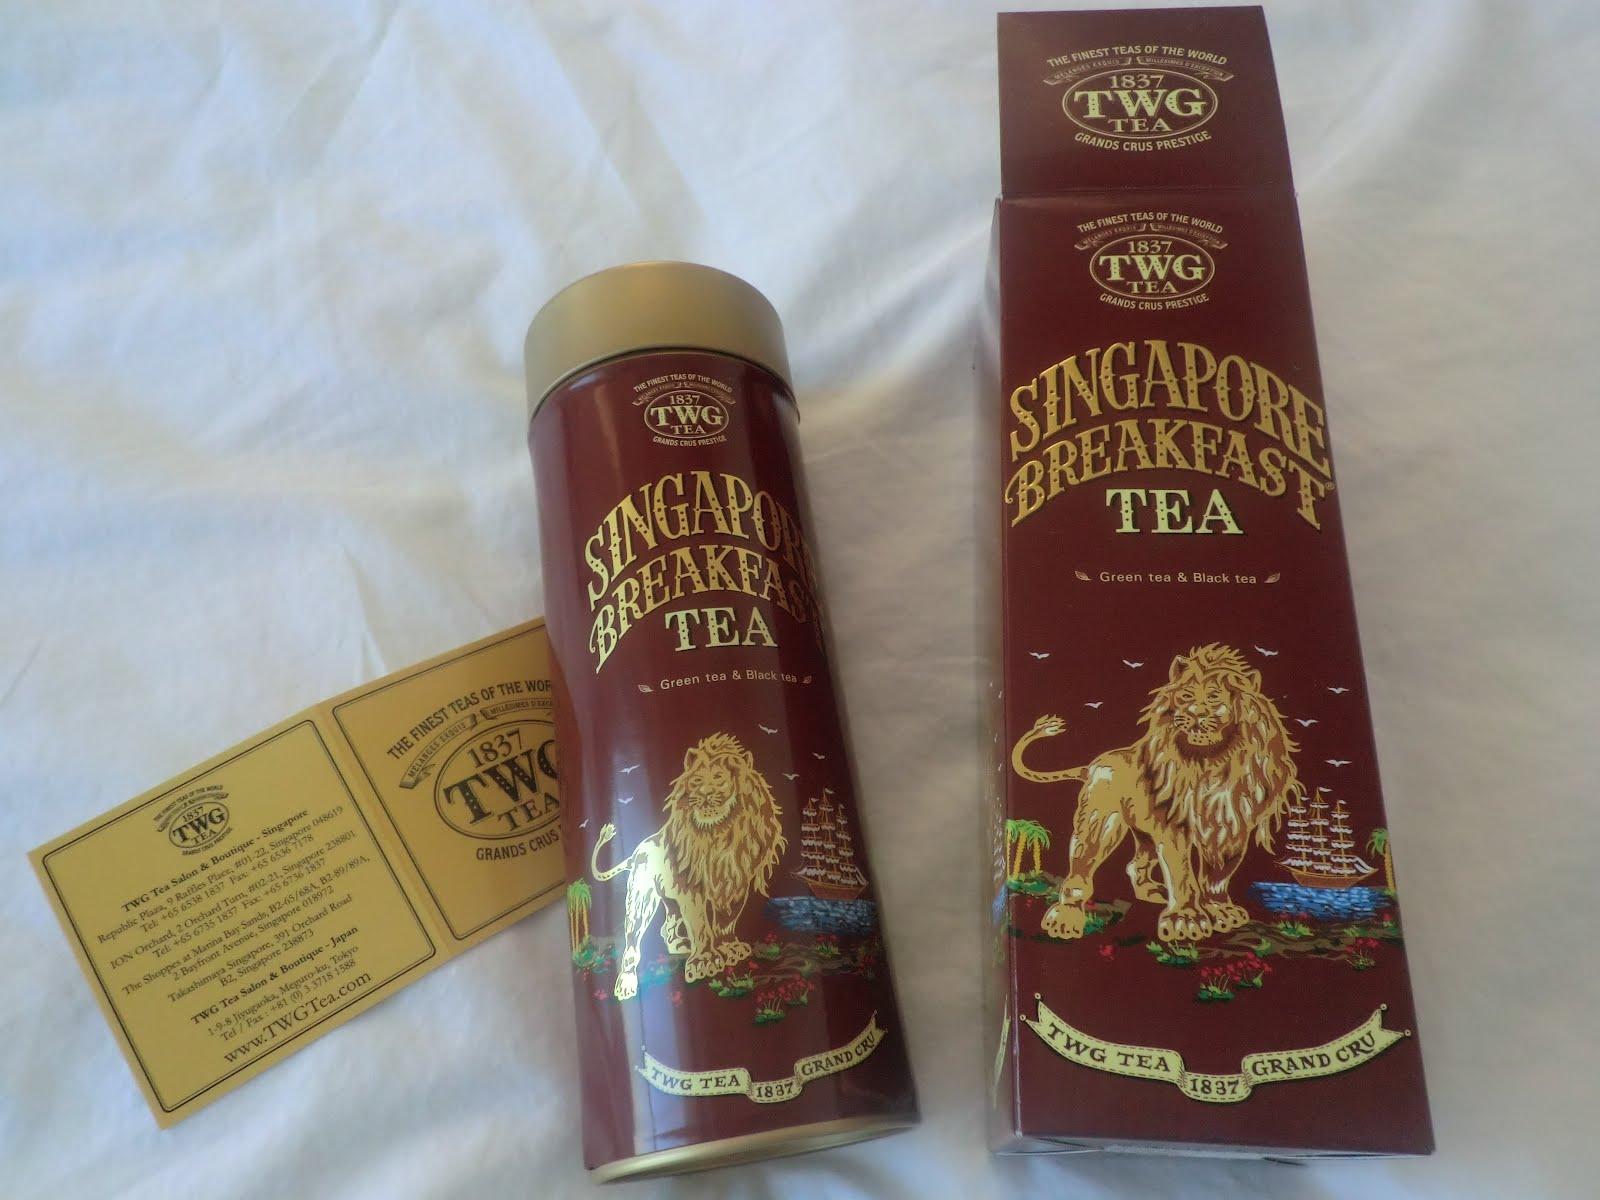 From Japan SINGAPORE BREAKFAST TEA From TWG Tea